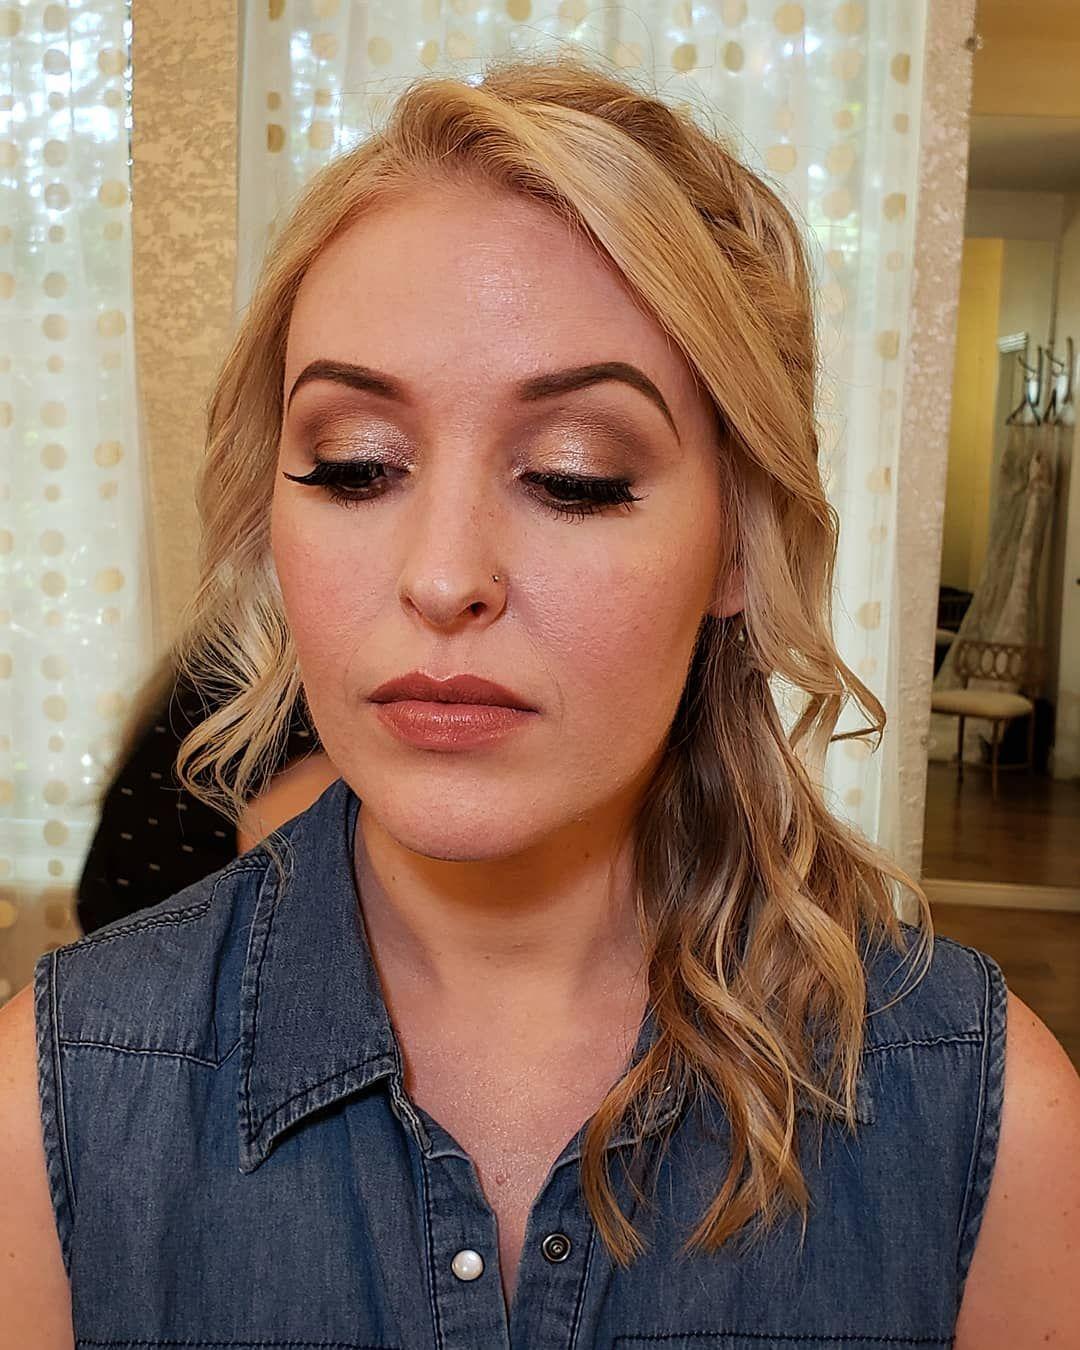 Makeup by Megan Berven & Hair by Sam Palmer at Glass